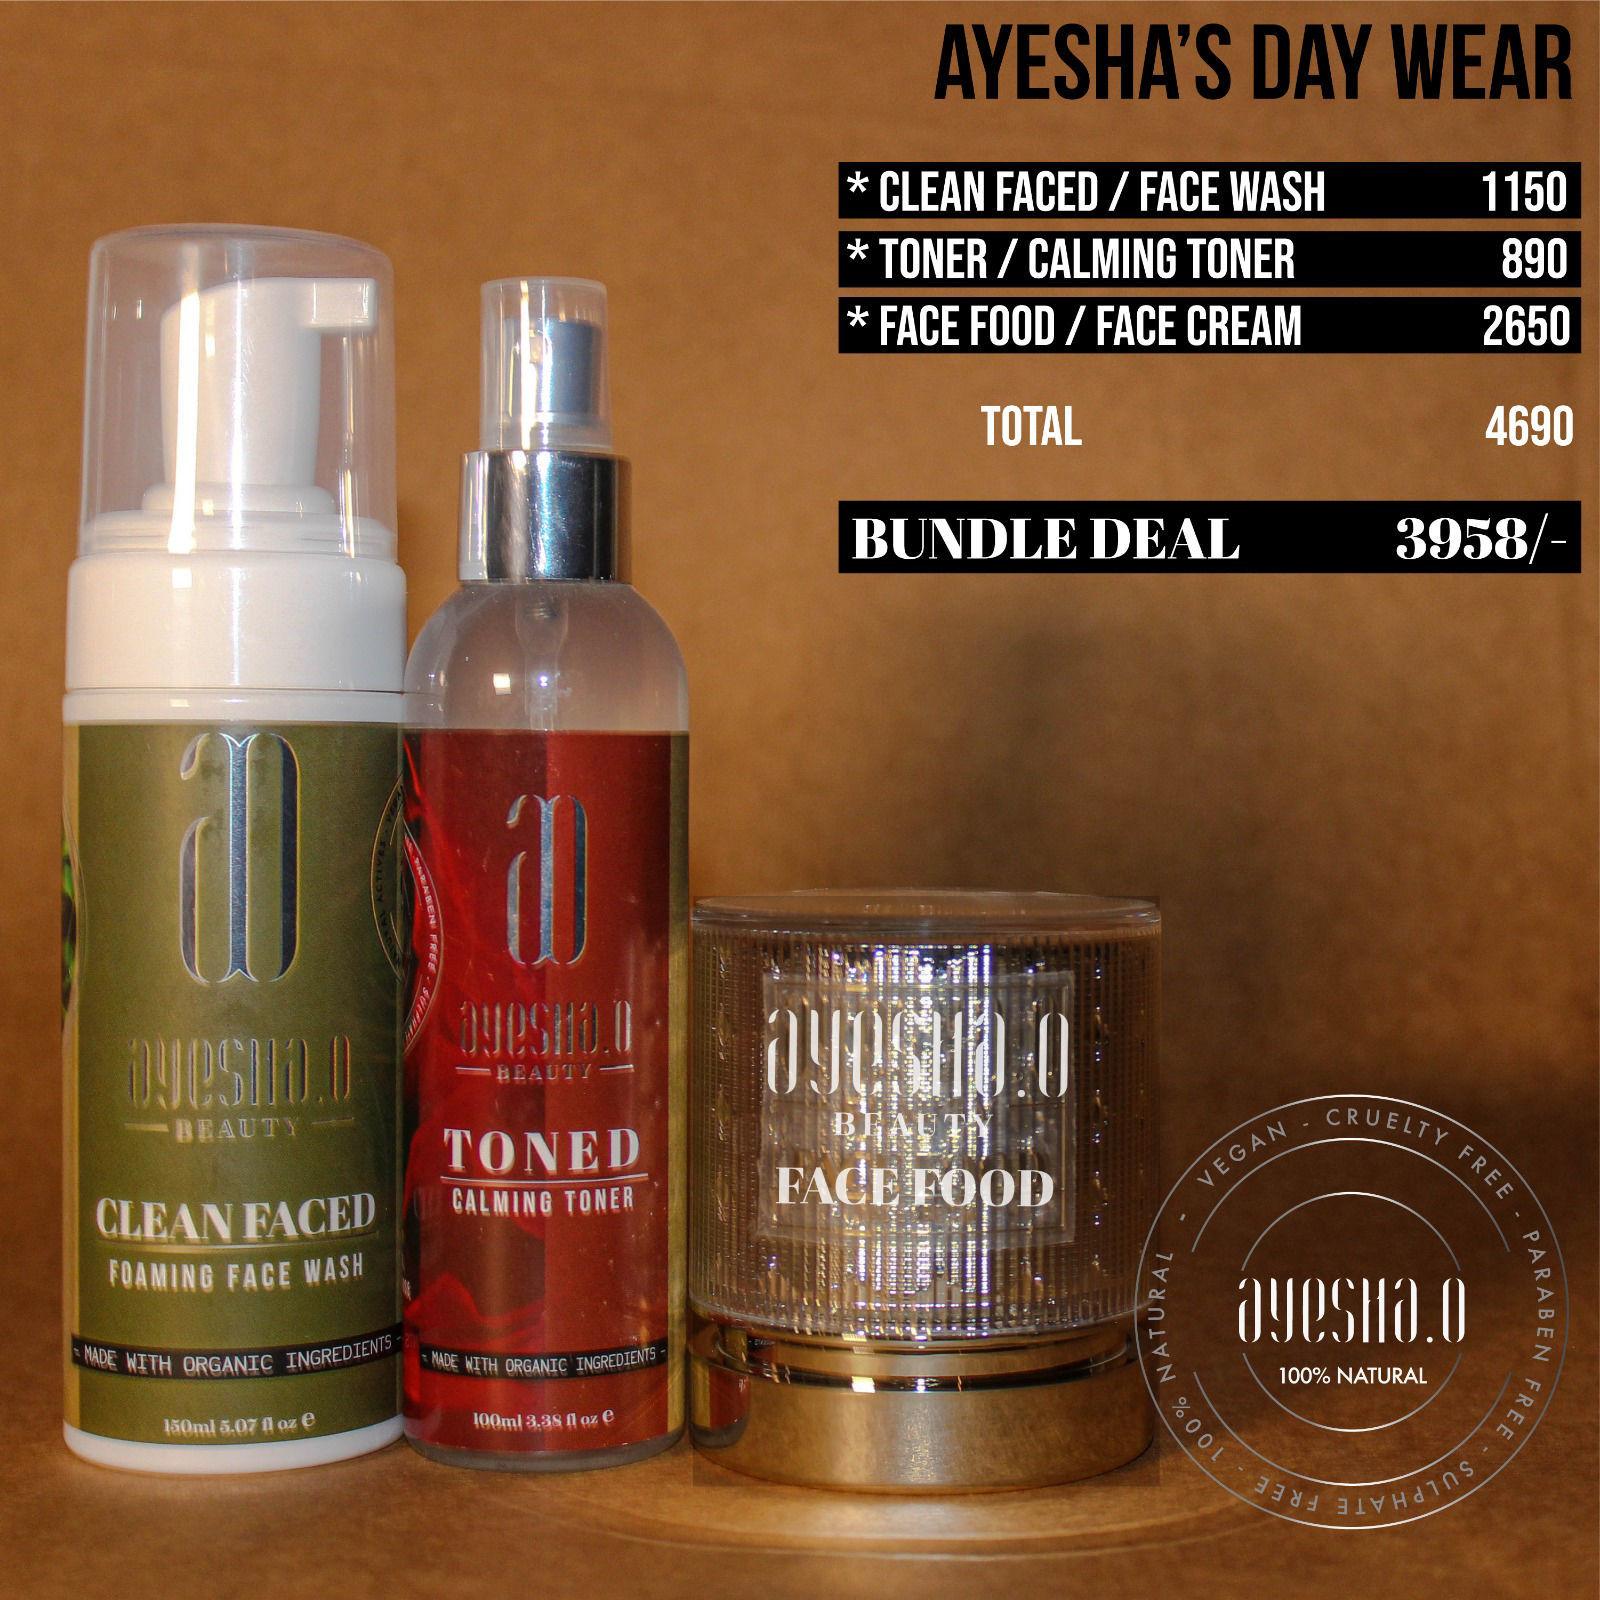 Ayesha's Day Wear